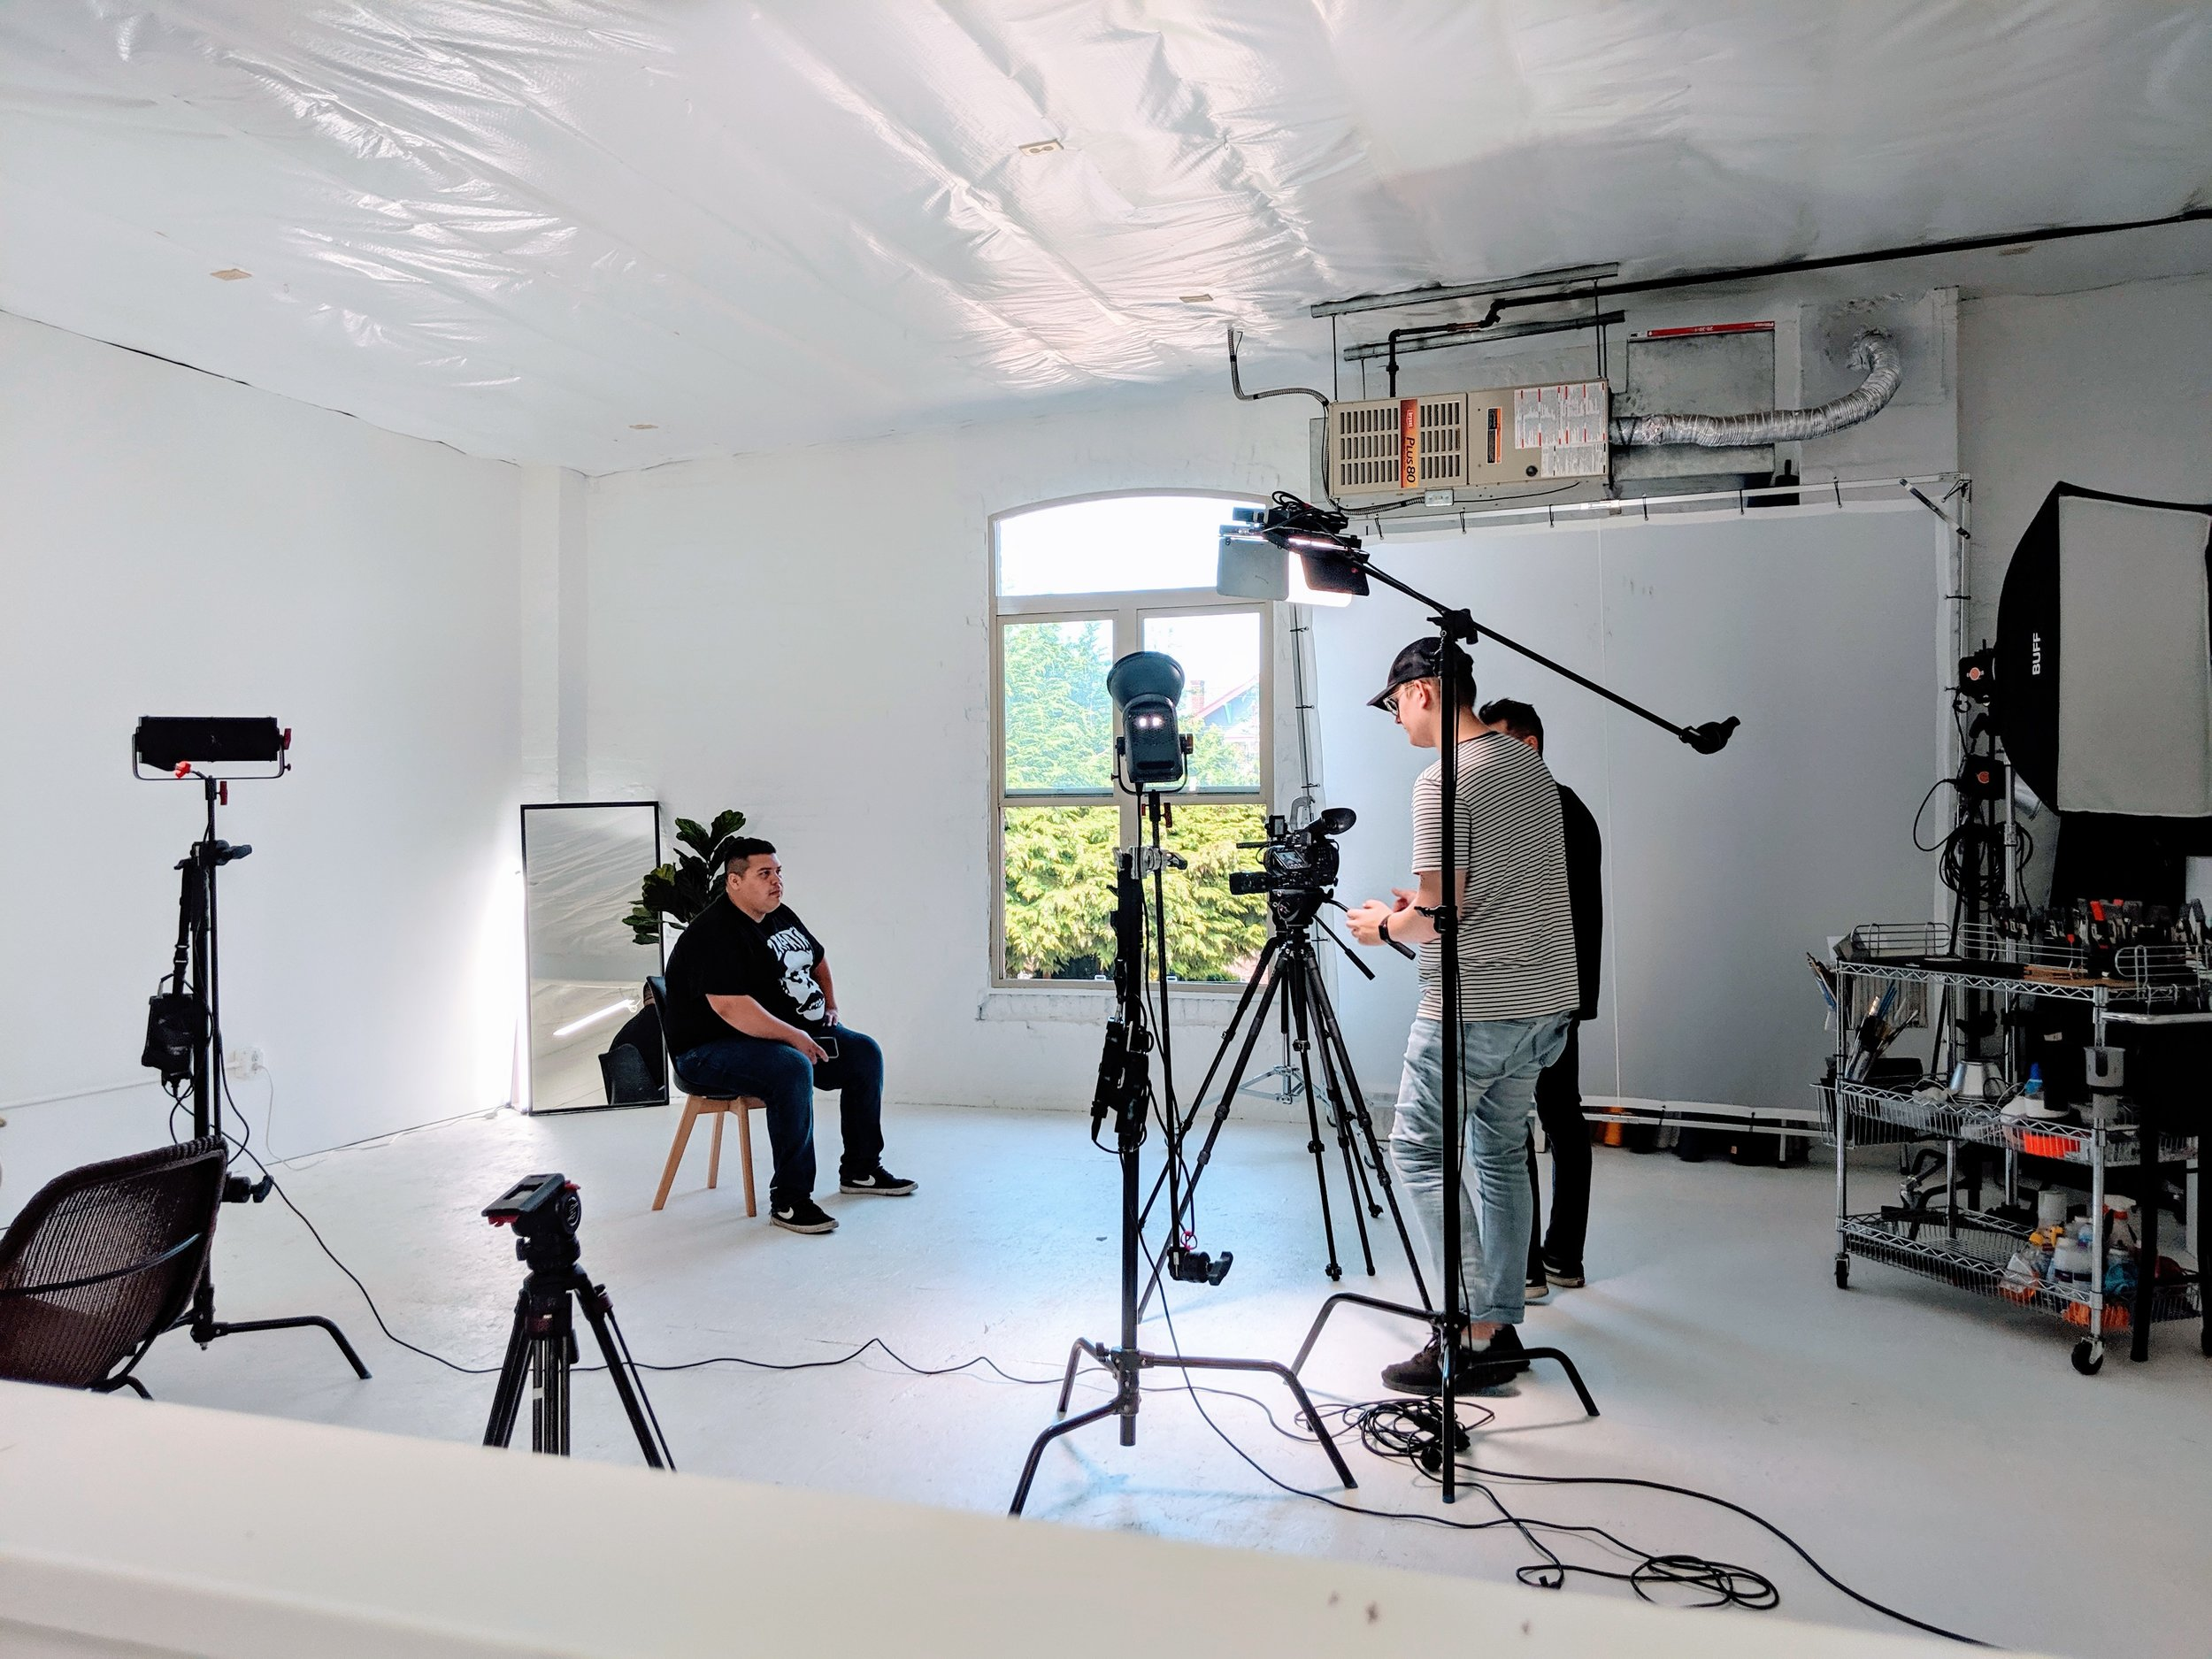 Everett-Snohimsh-photo-video-rental-studio-3.jpg